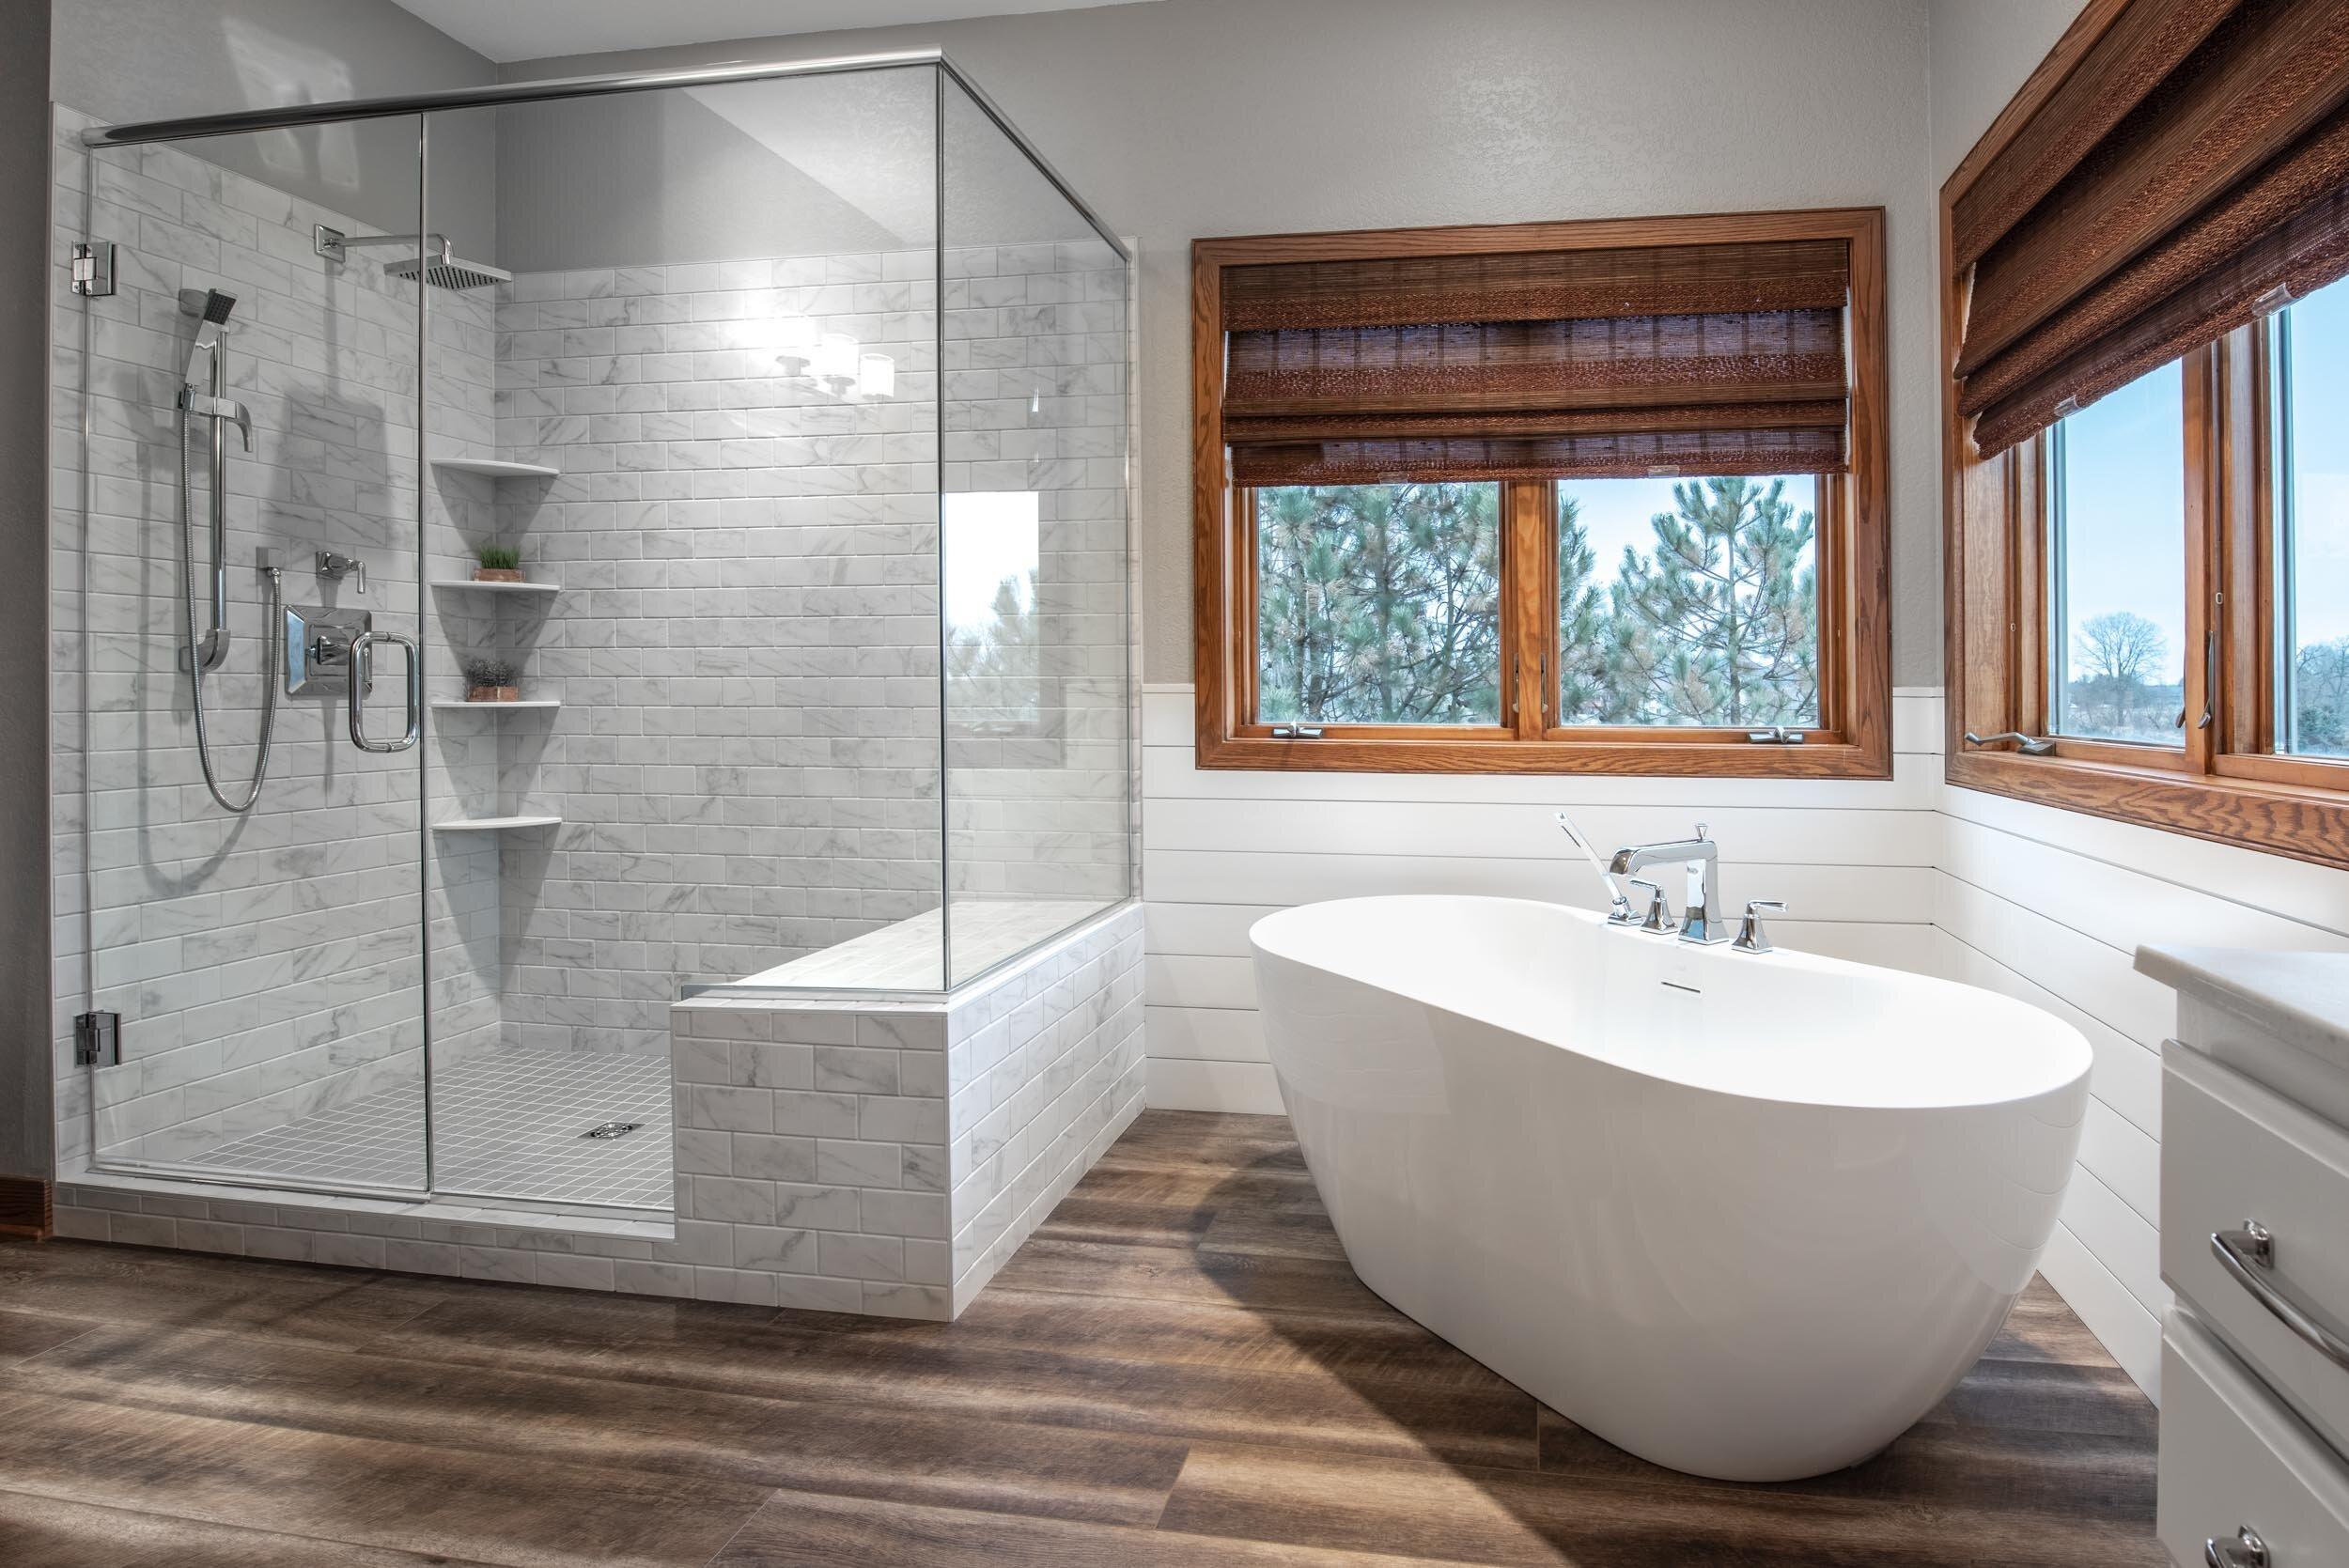 Is Wood Look Porcelain Tile A Good Choice When Remodeling Degnan Design Build Remodel